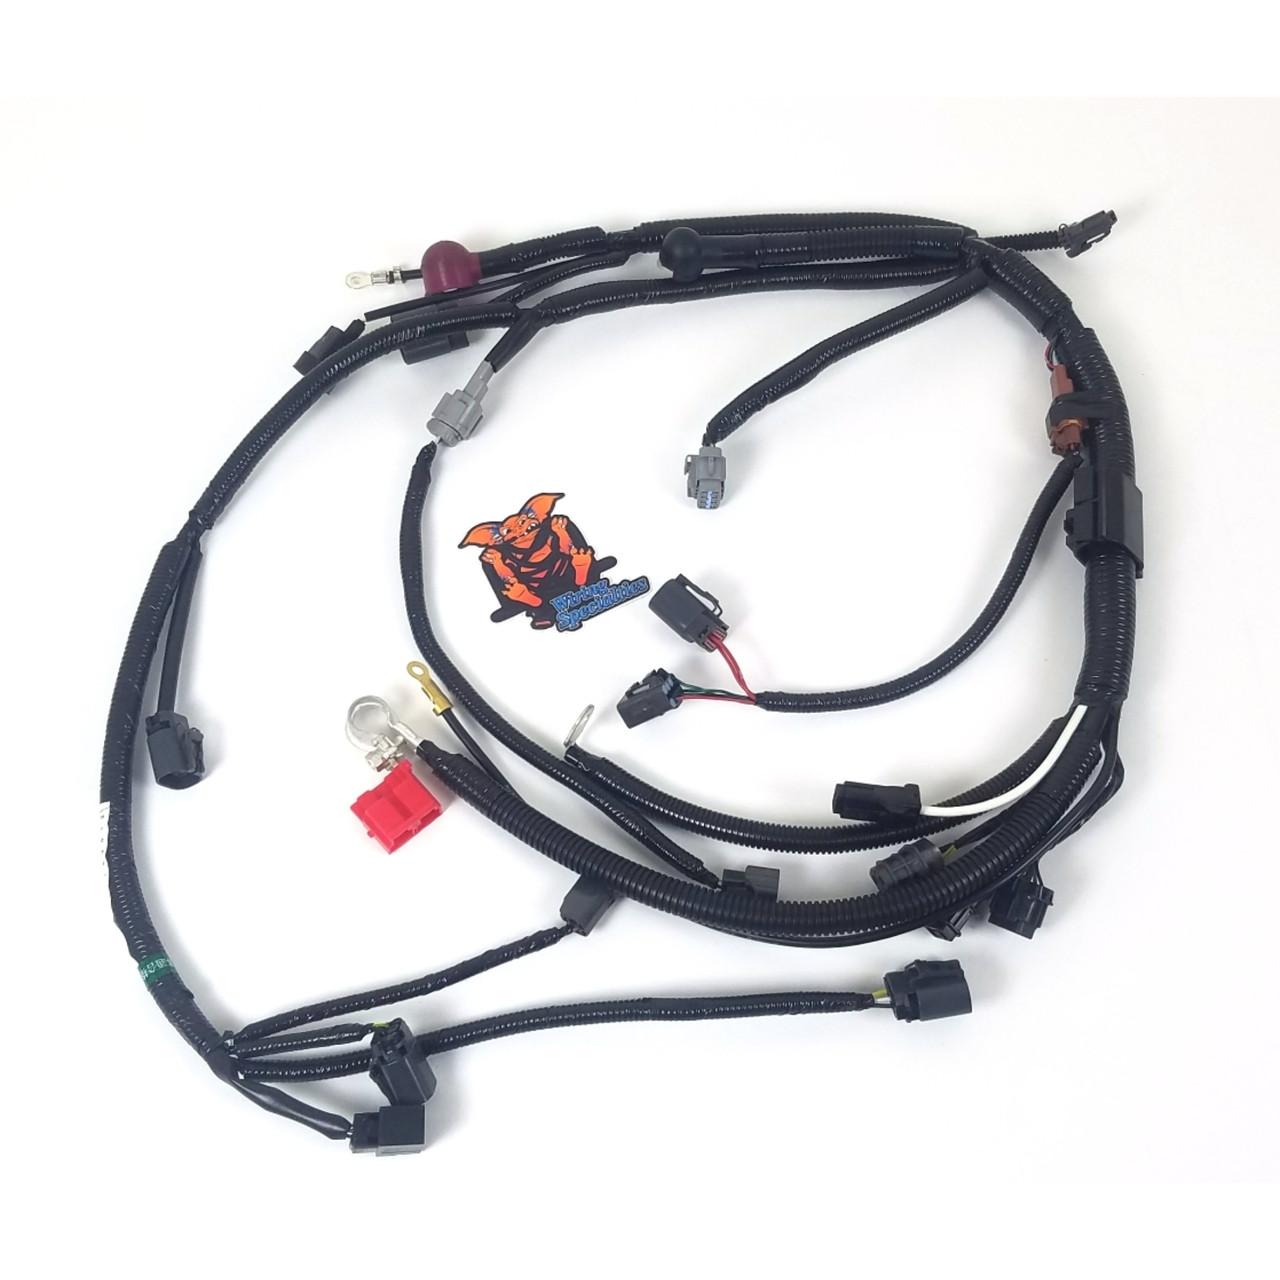 hight resolution of nissan 240sx ka24de wiring harness wiring diagrams lol jeep trailer wiring harness ka24de wiring harness